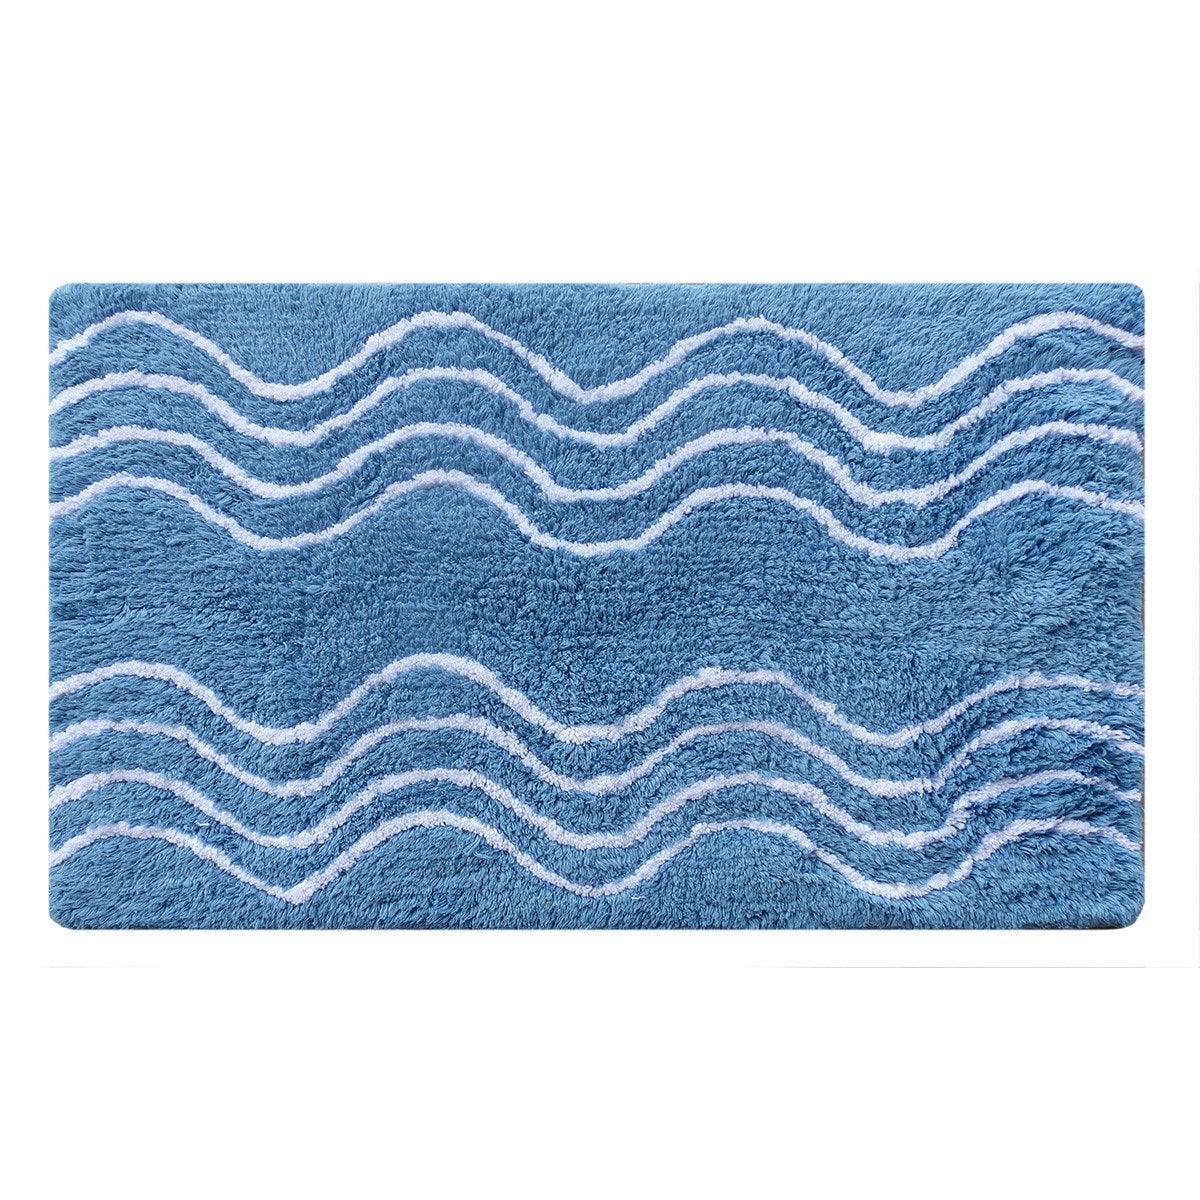 Tapis de bain l.50 x L.80 cm fjord n°3, Waves SENSEA